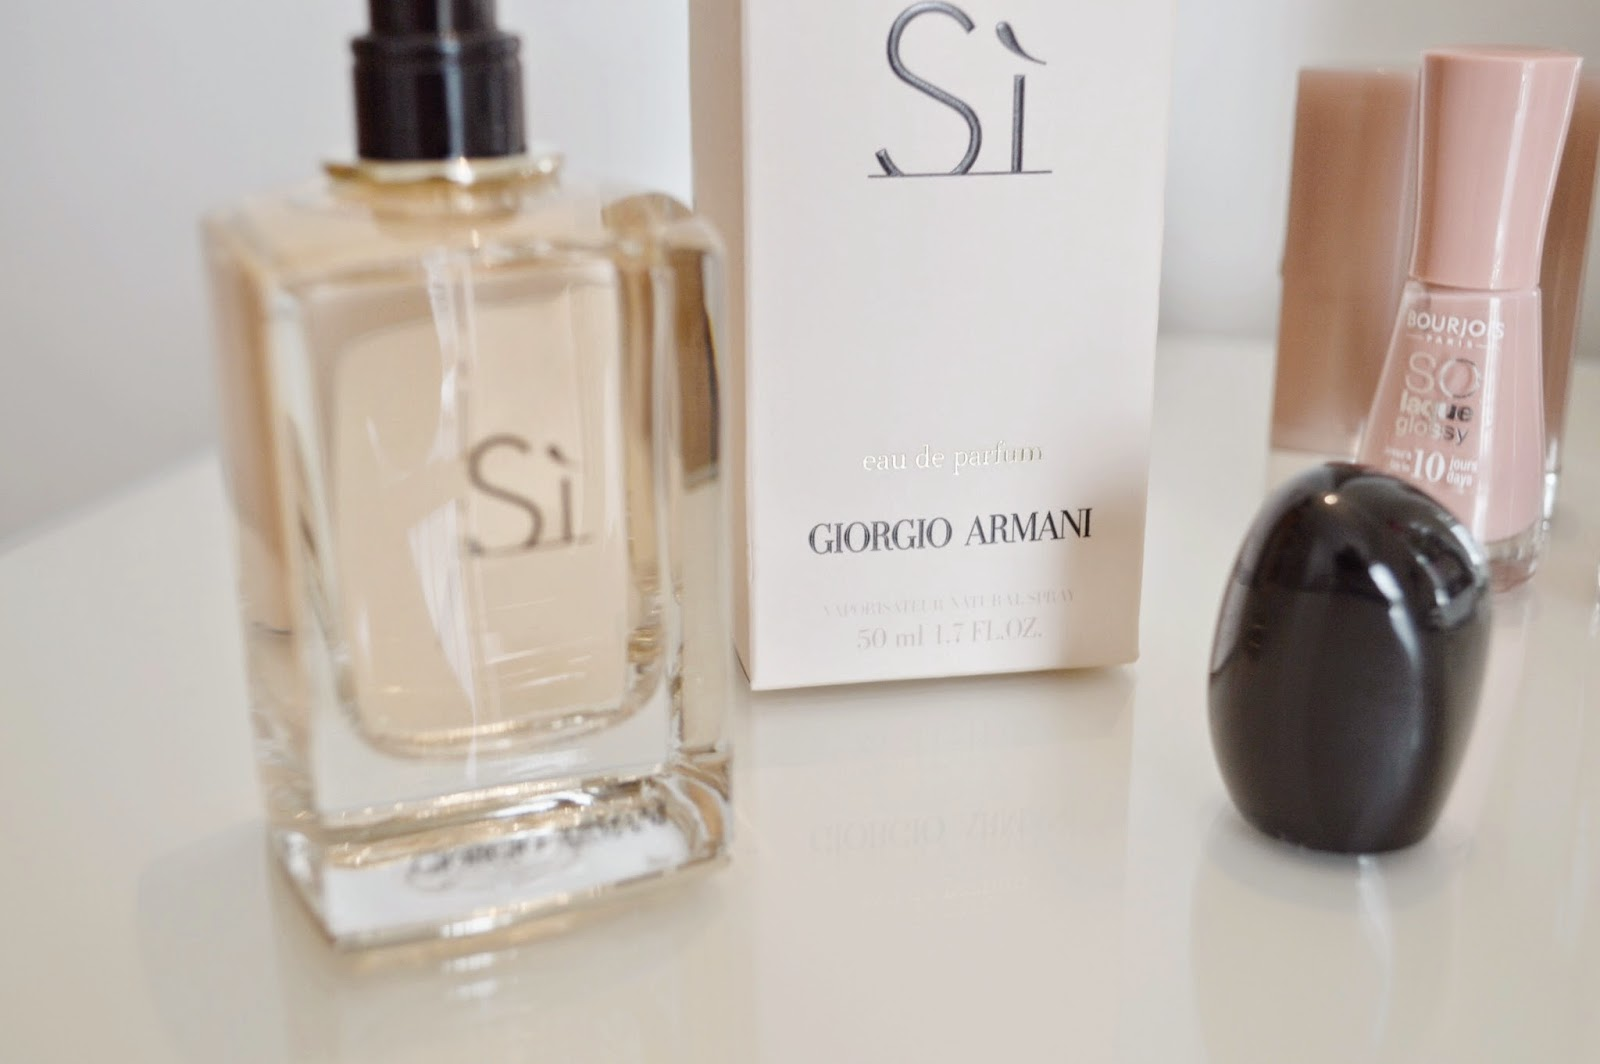 giorgio armani si eau de parfum perfume ashleigh beauty. Black Bedroom Furniture Sets. Home Design Ideas